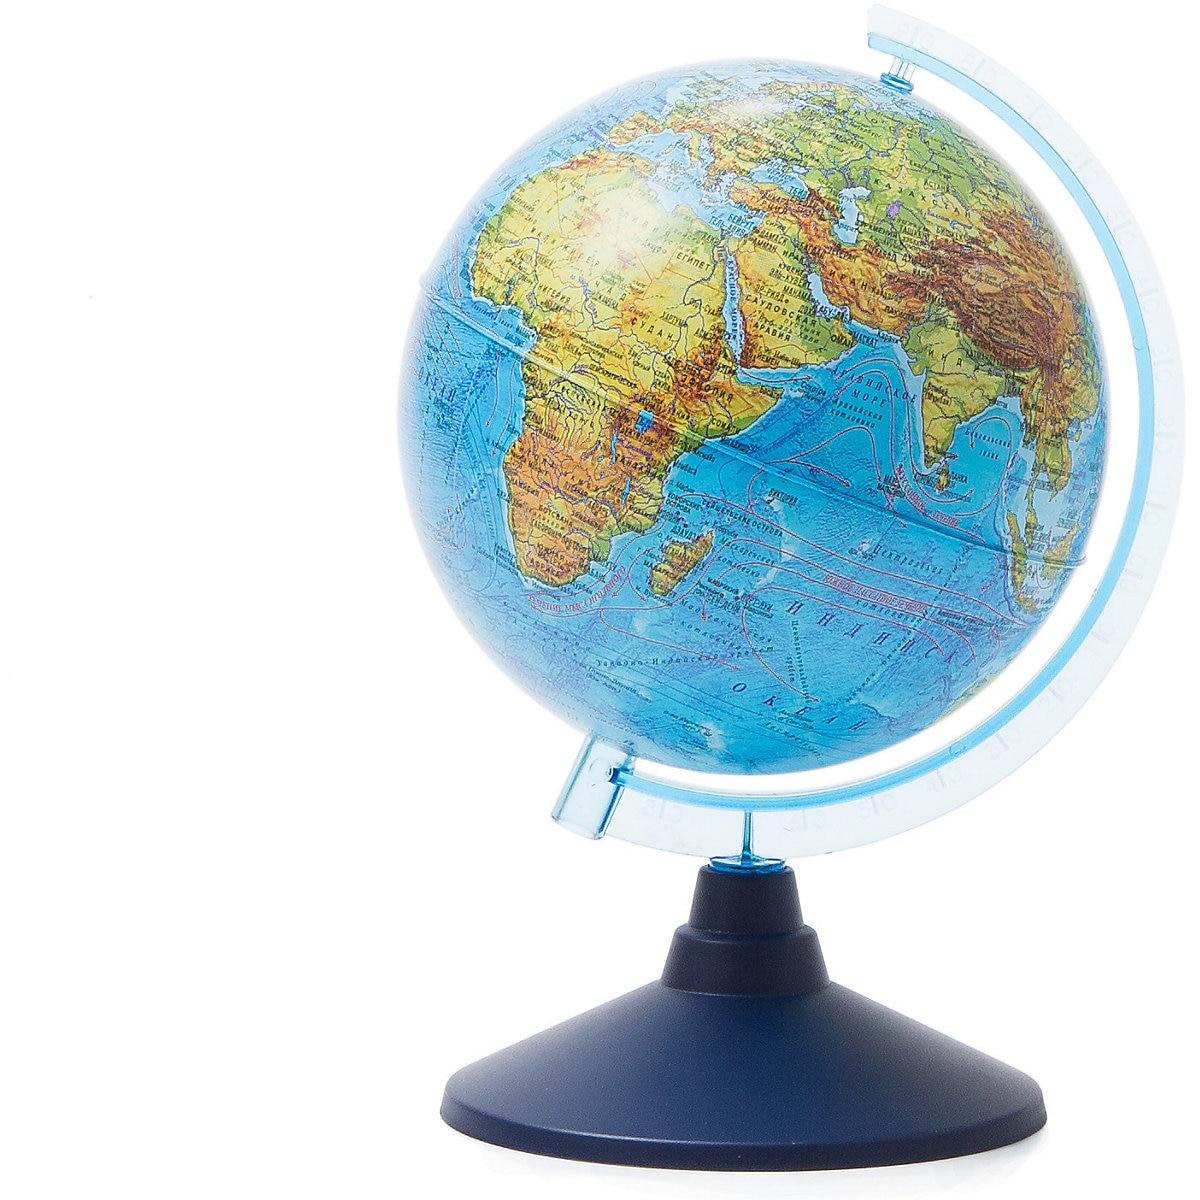 GLOBEN Desk Set 8075105 Globe Accessories Organizer For Office And School Schools Offices MTpromo